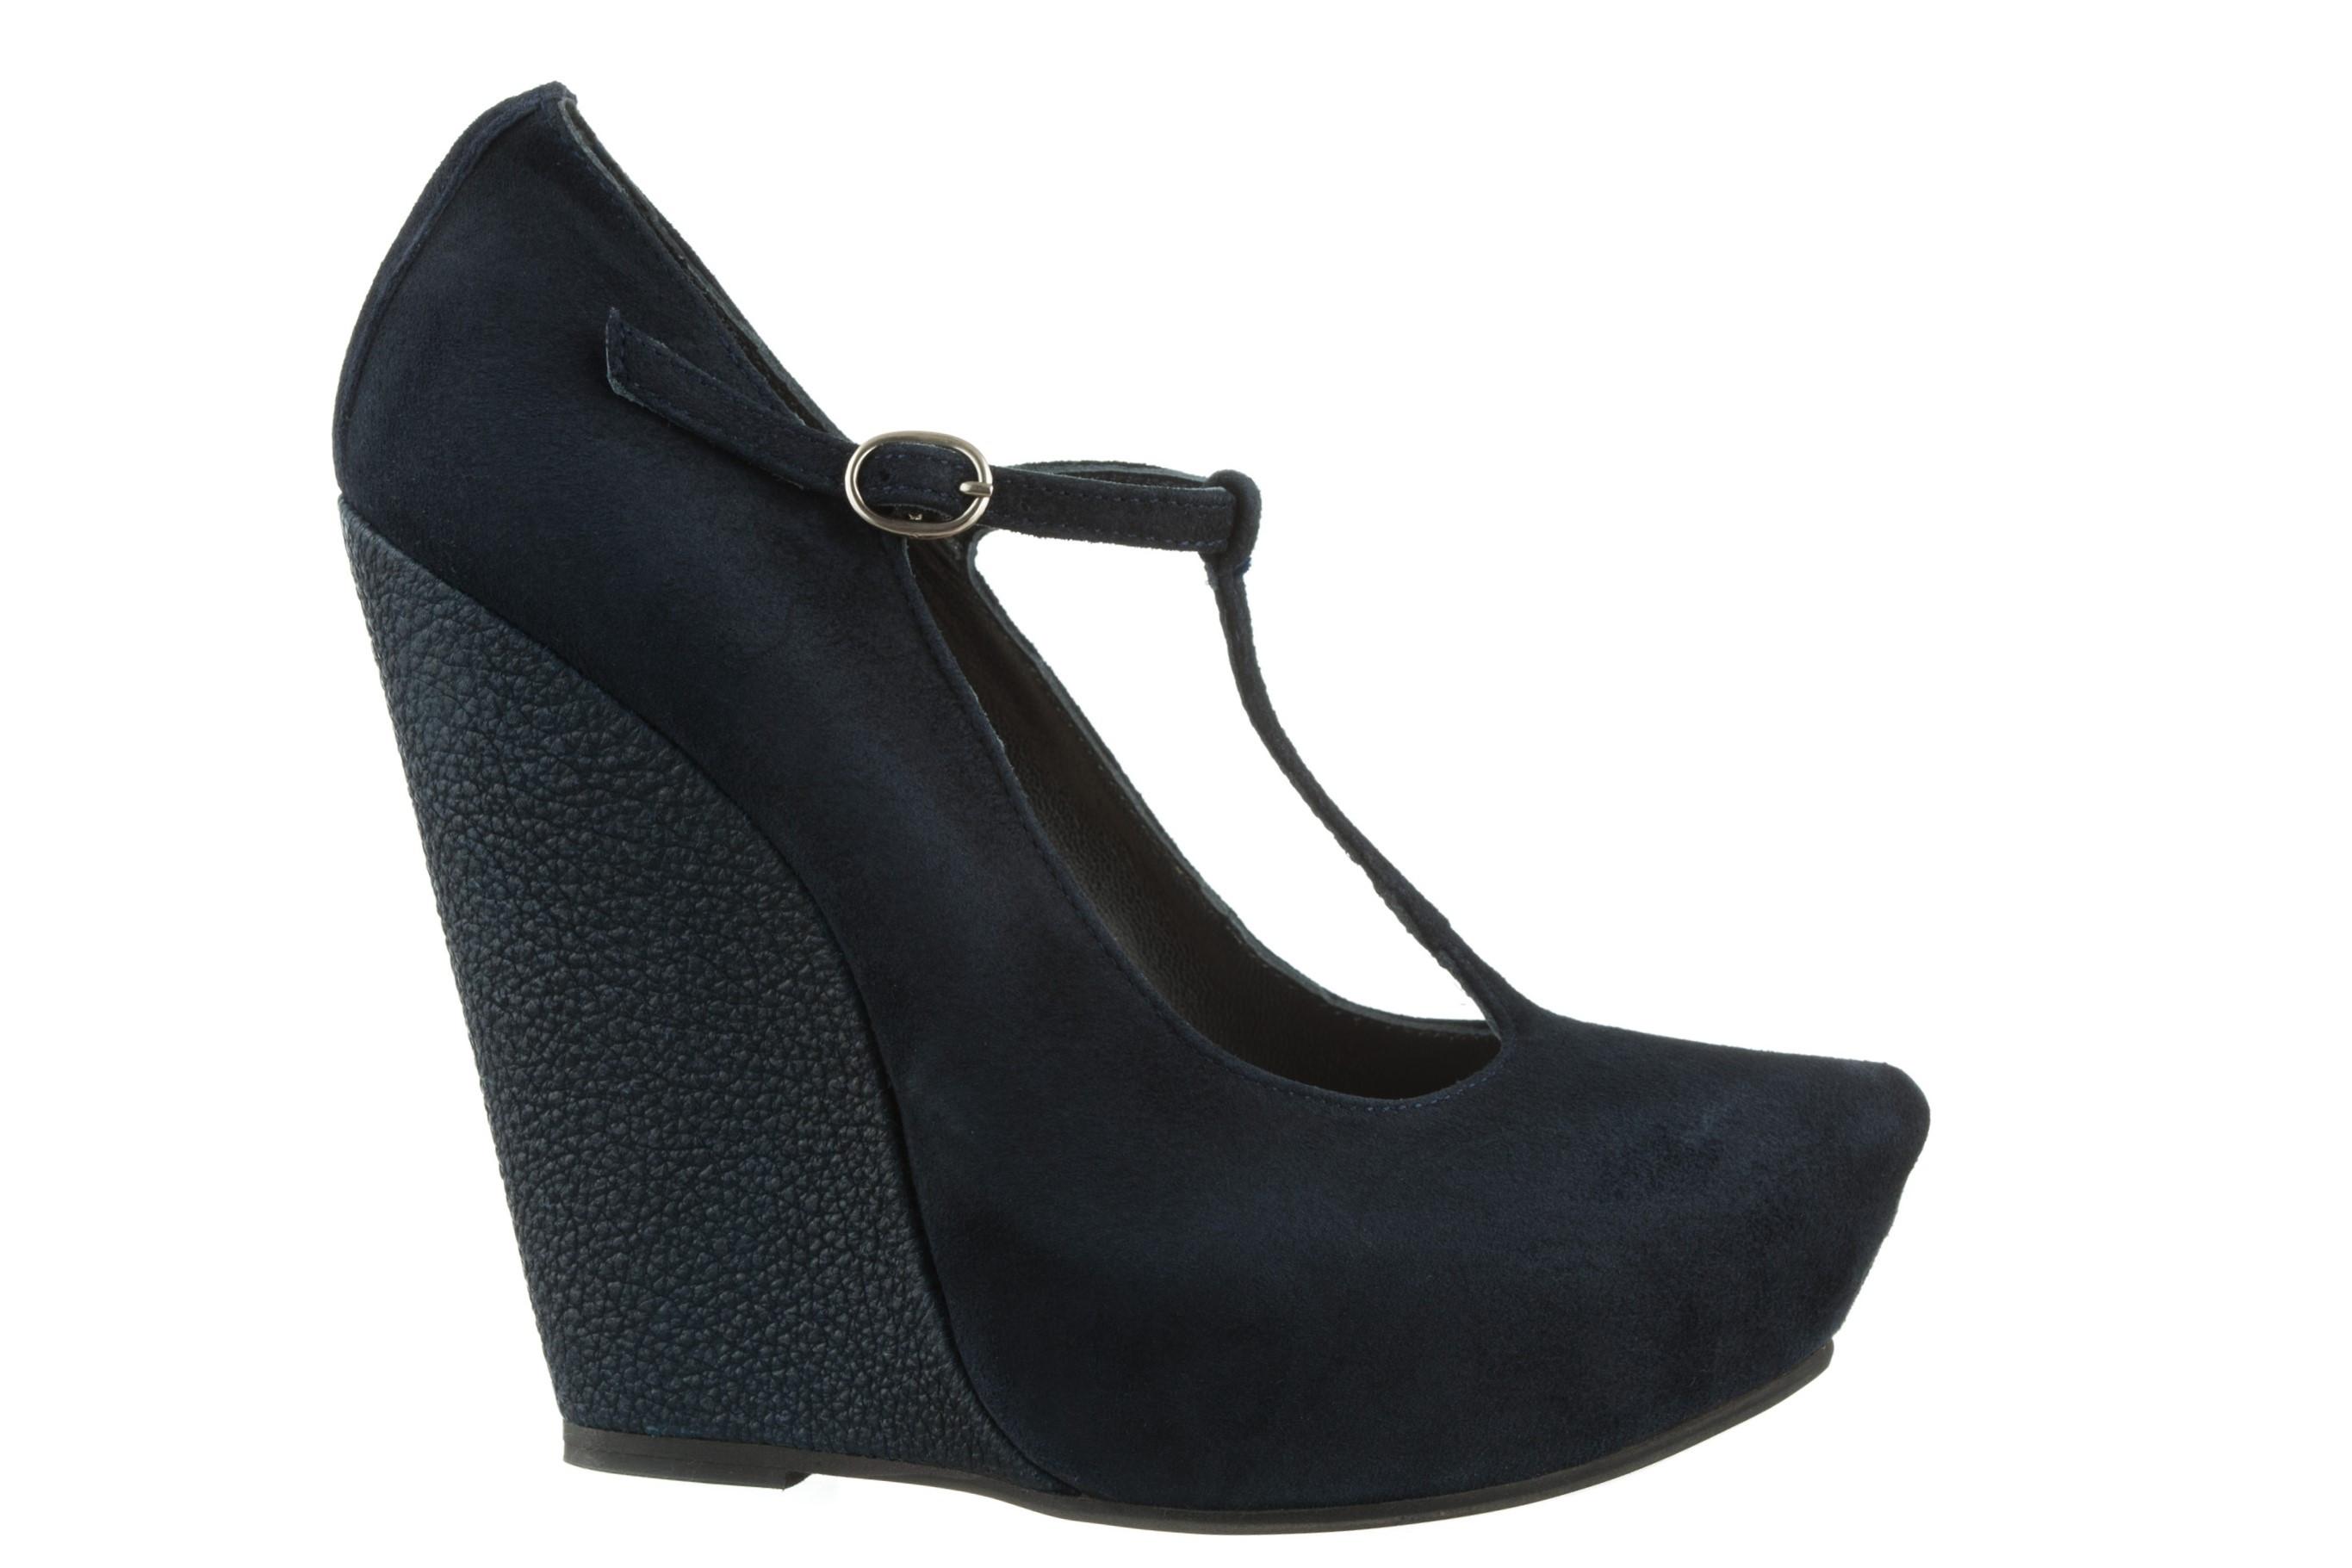 Joye Blu - Shoes Gianrico Mori 48c6668837c